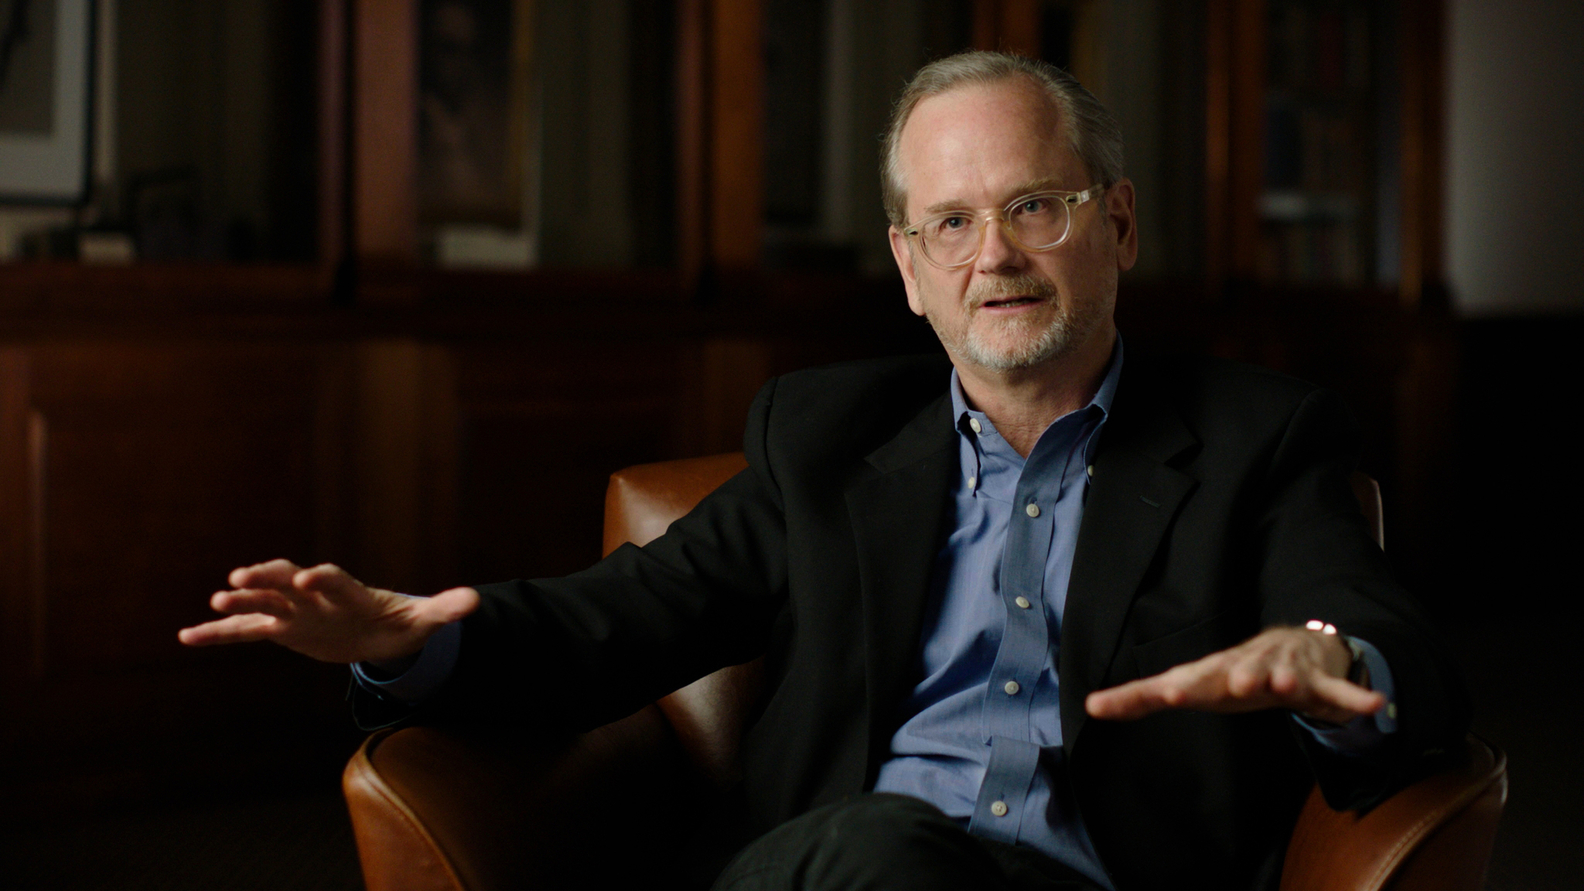 Harvard Law School Professor Lawrence Lessig